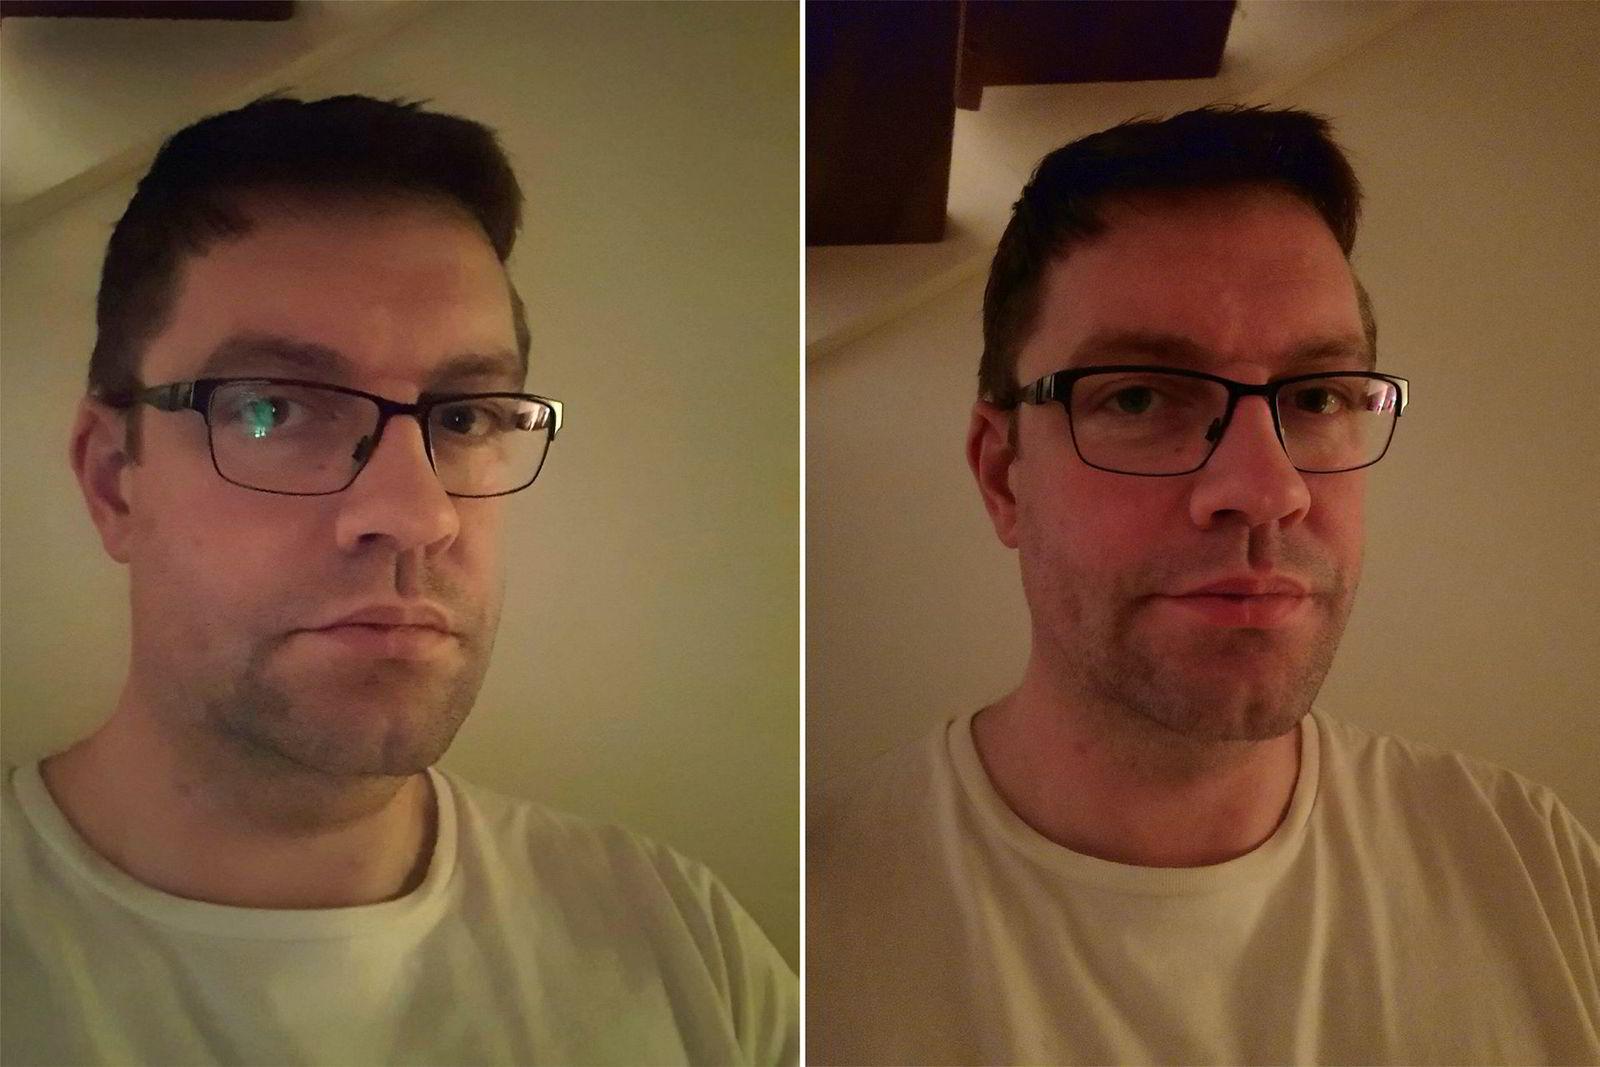 Selfie i svak belysning. Galaxy S10+ til venstre, Mate 20 Pro til høyre.